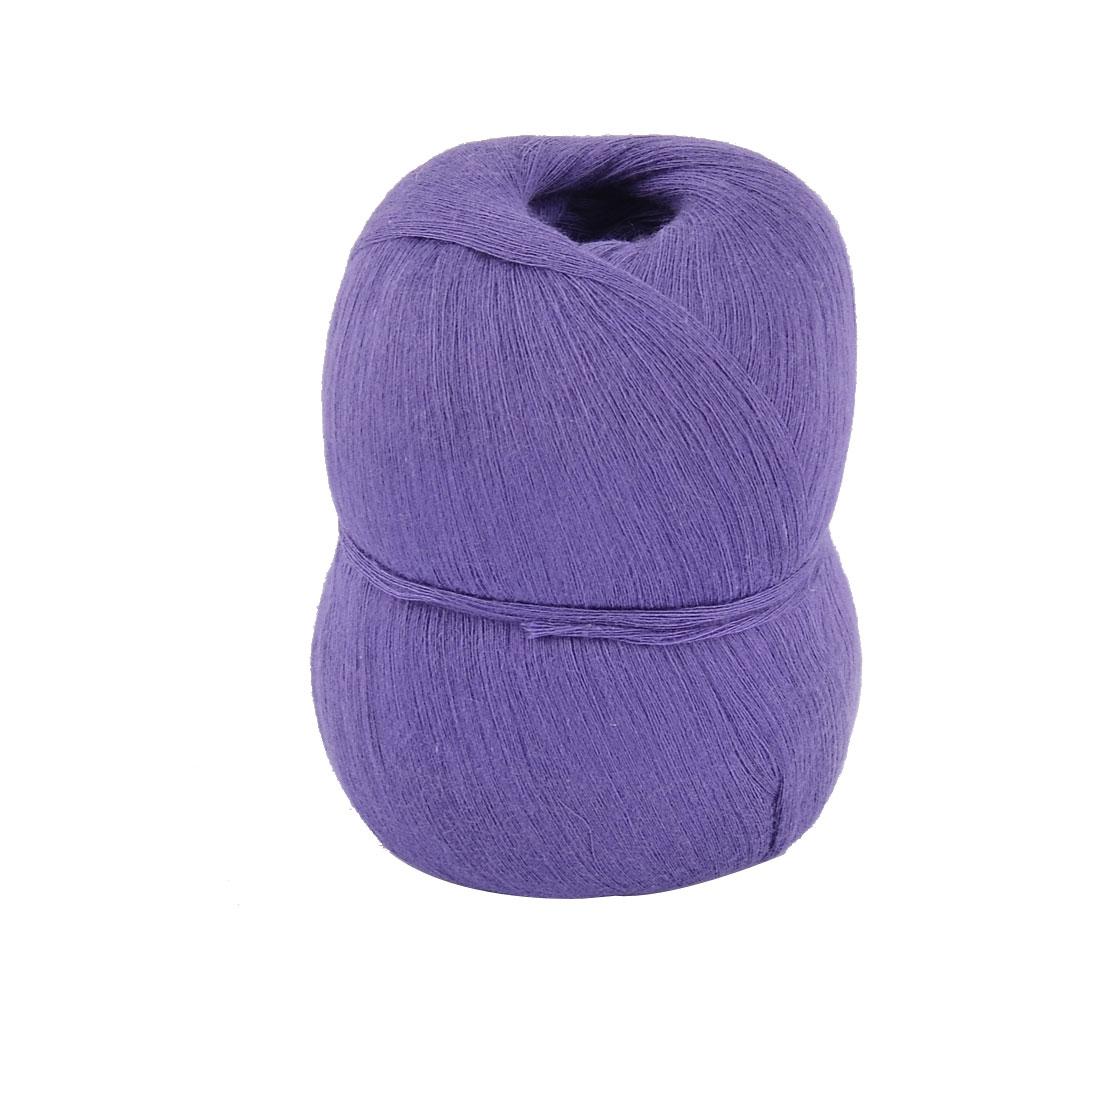 Home Hand DIY Knitting Clothes Cotton Crochet Thread Craft Yarn Dark Purple